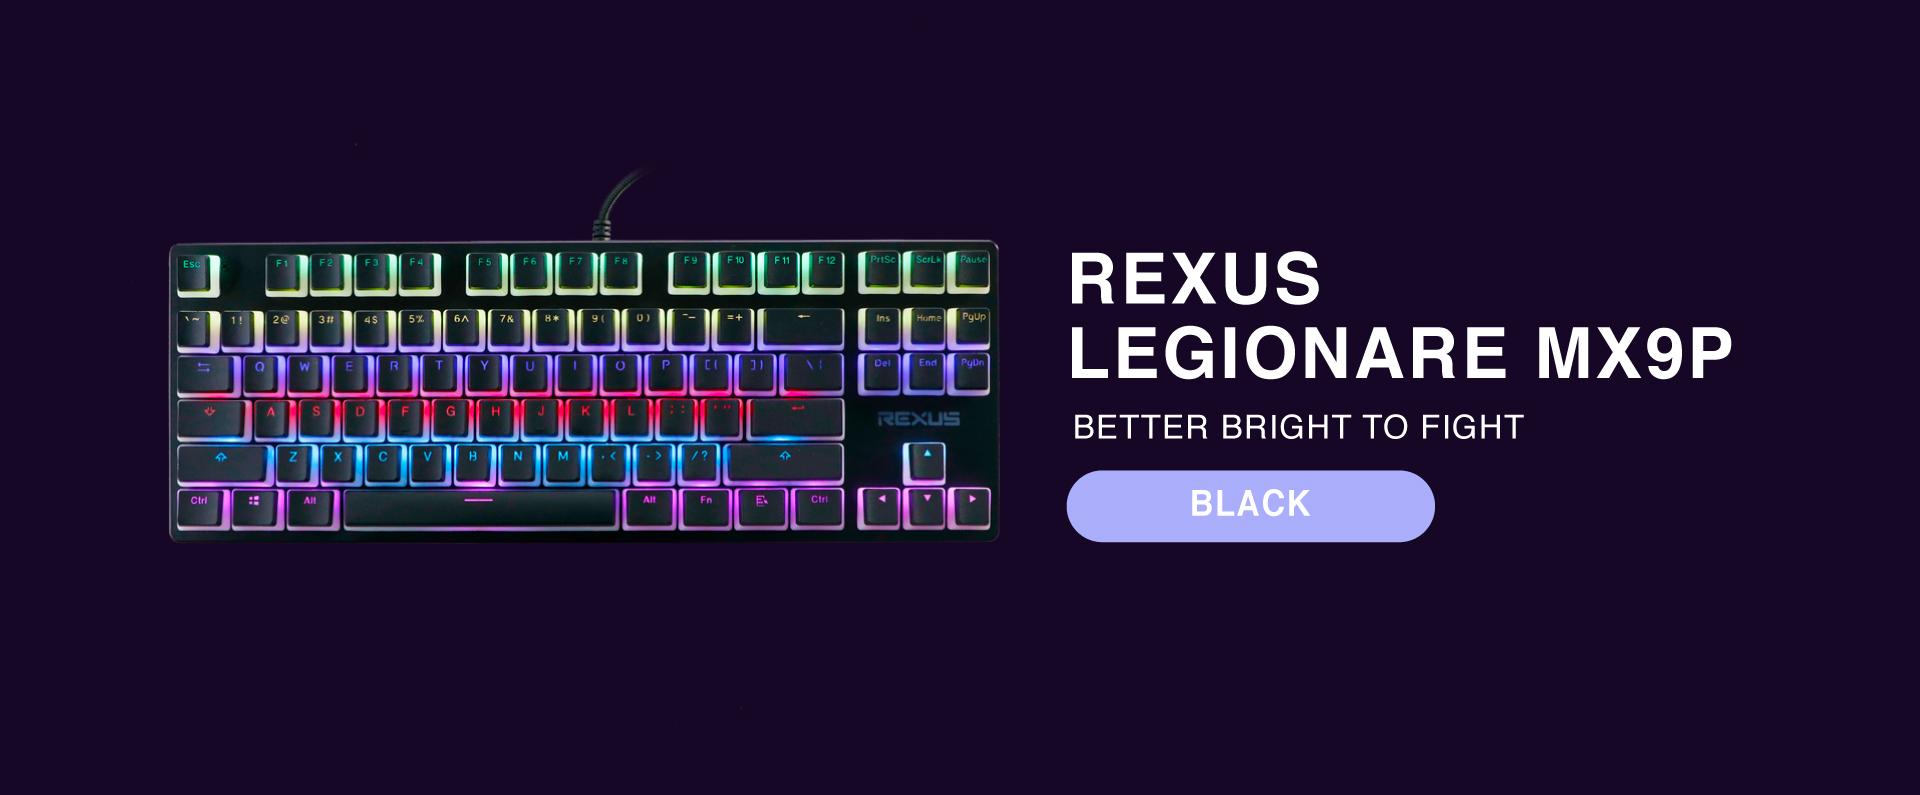 keyboard Rexus Legionare MX9P 3 1